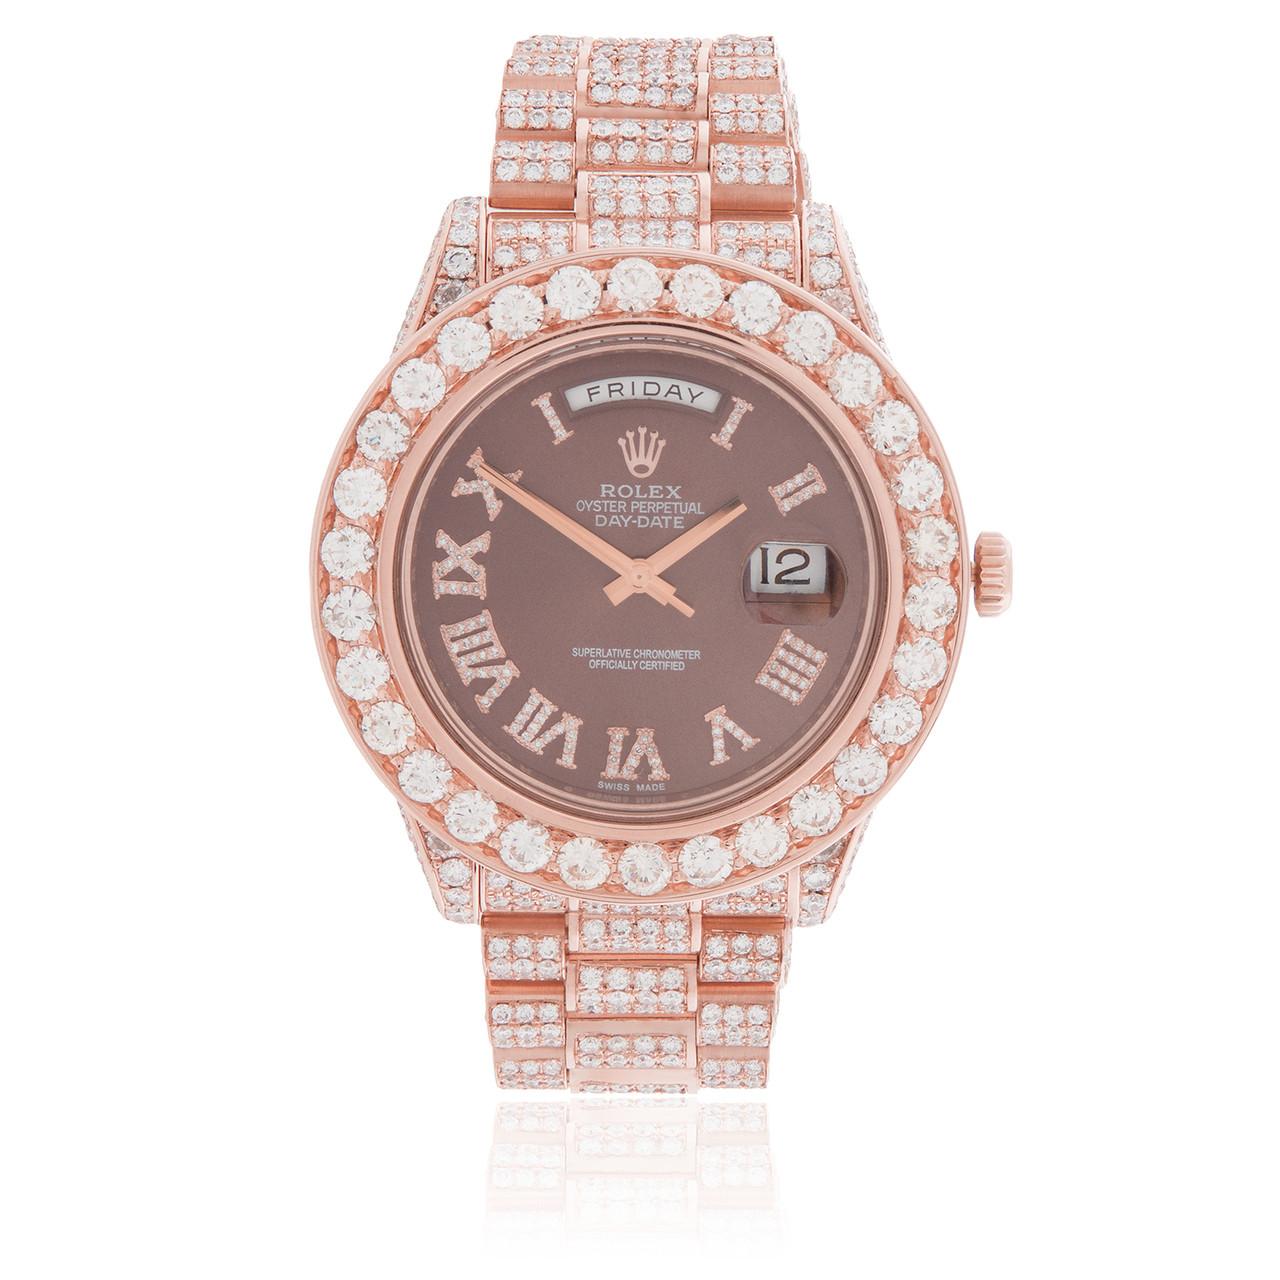 8b6a476c166a Rolex Day-Date 18K Rose Gold President 21.5ct Diamond Automatic Men s Watch  - Shyne Jewelers